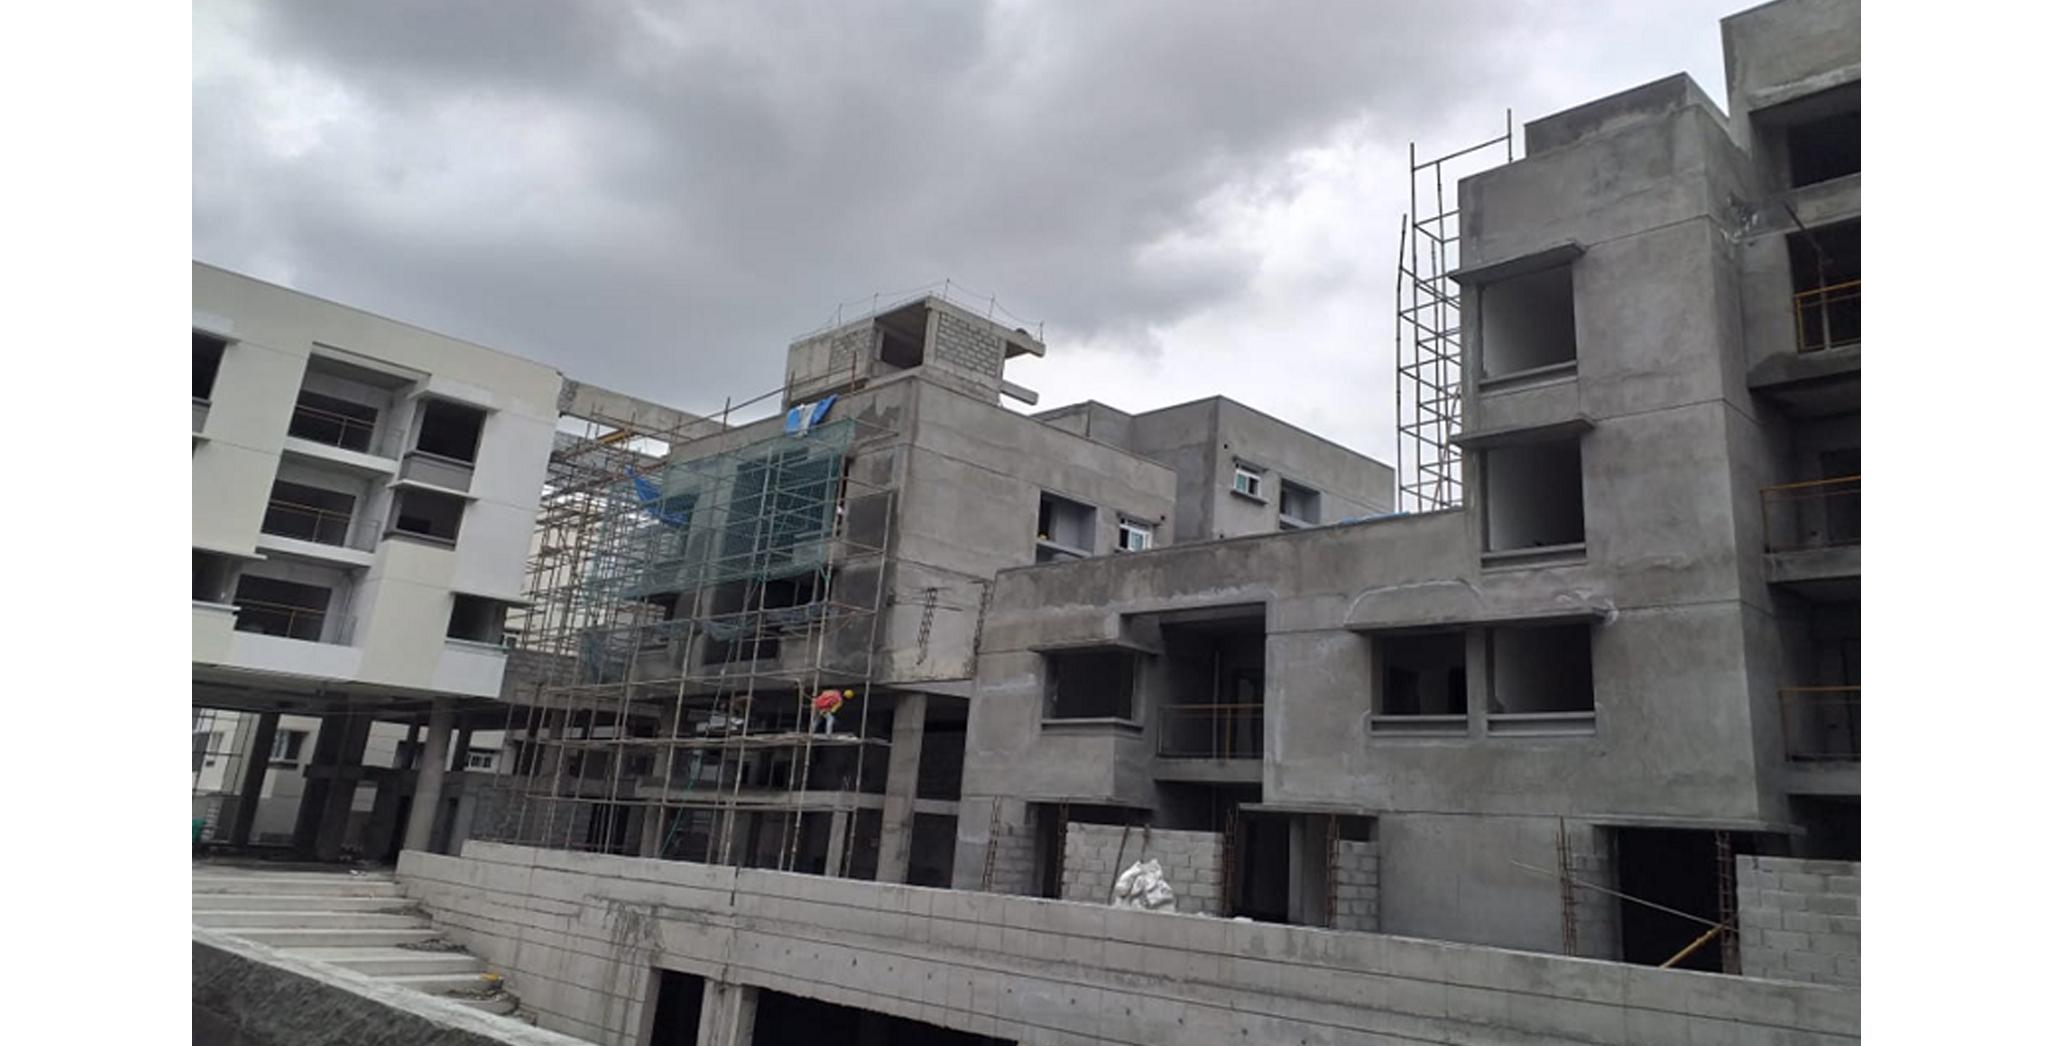 Aug 2021 - Podium Side: Block Q & R - External plastering works in progress